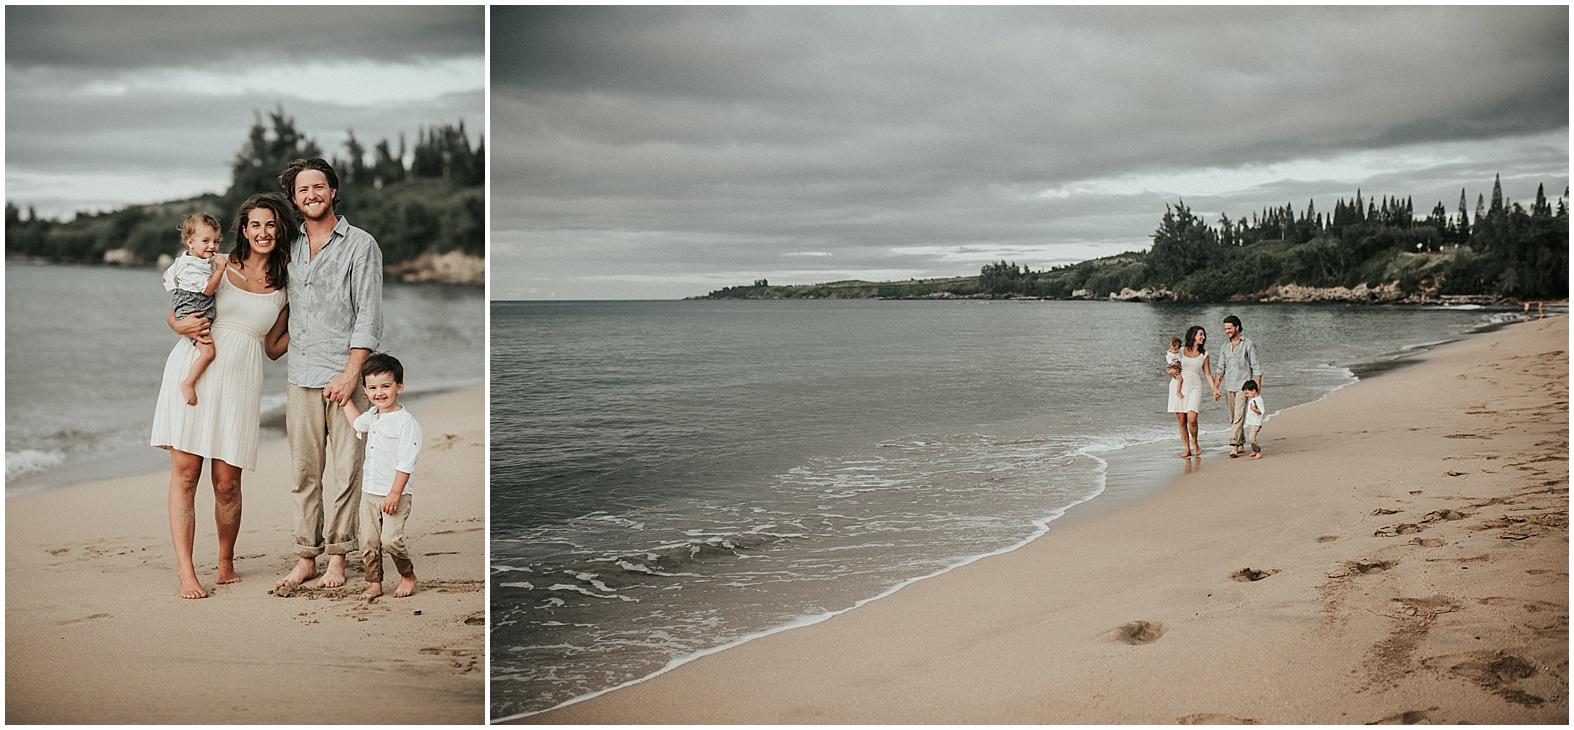 Maui family photography1.jpg